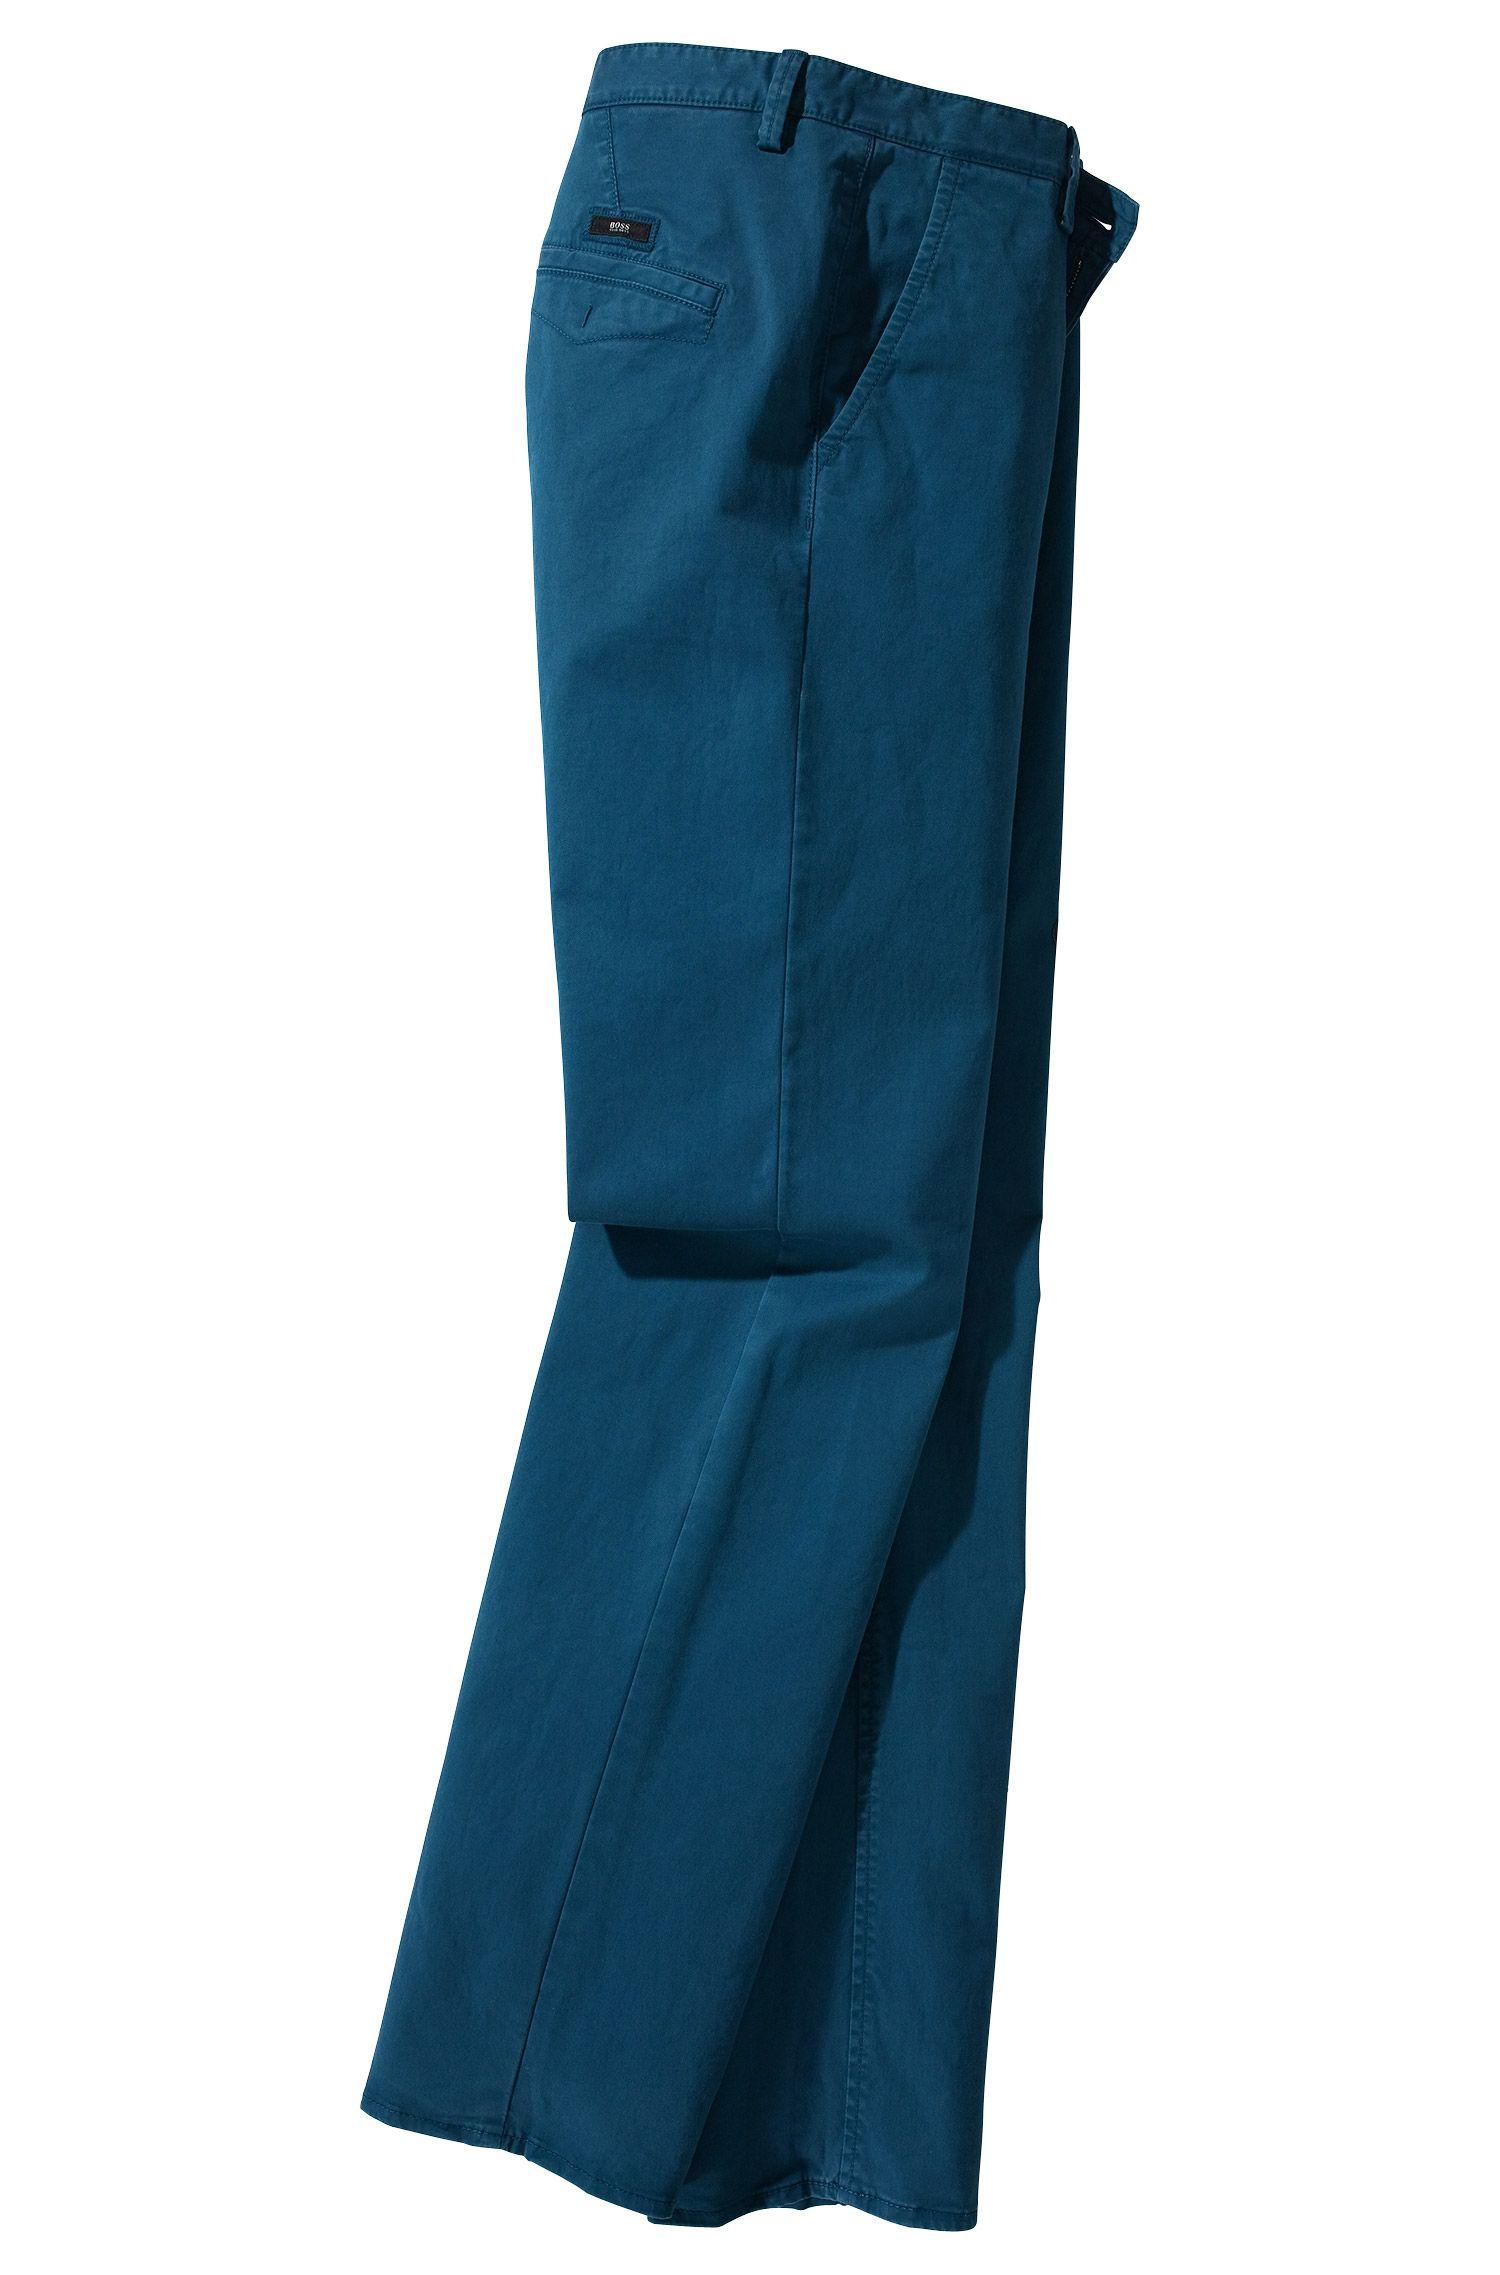 Pantalon Chino Slim Fit, Rice-D